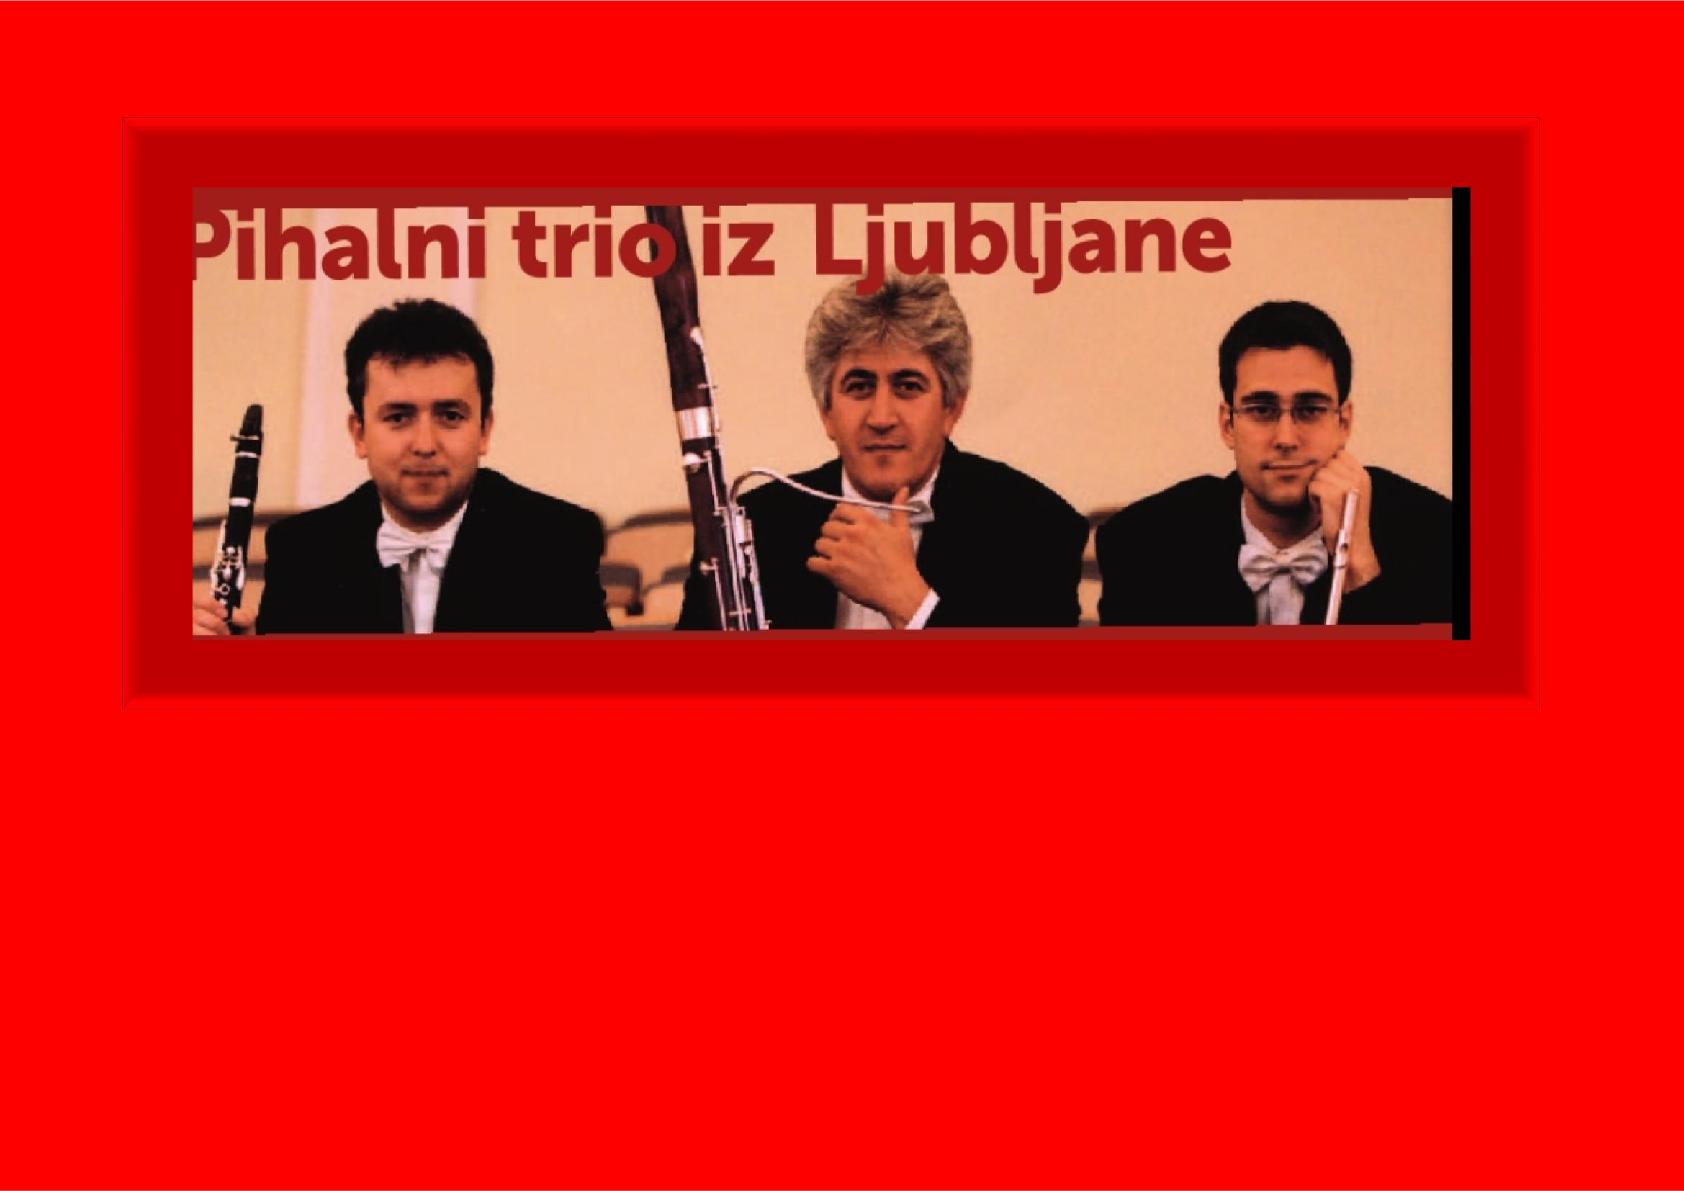 10.12.2017 ob 11.00 uri – Pihalni trio iz Ljubljane